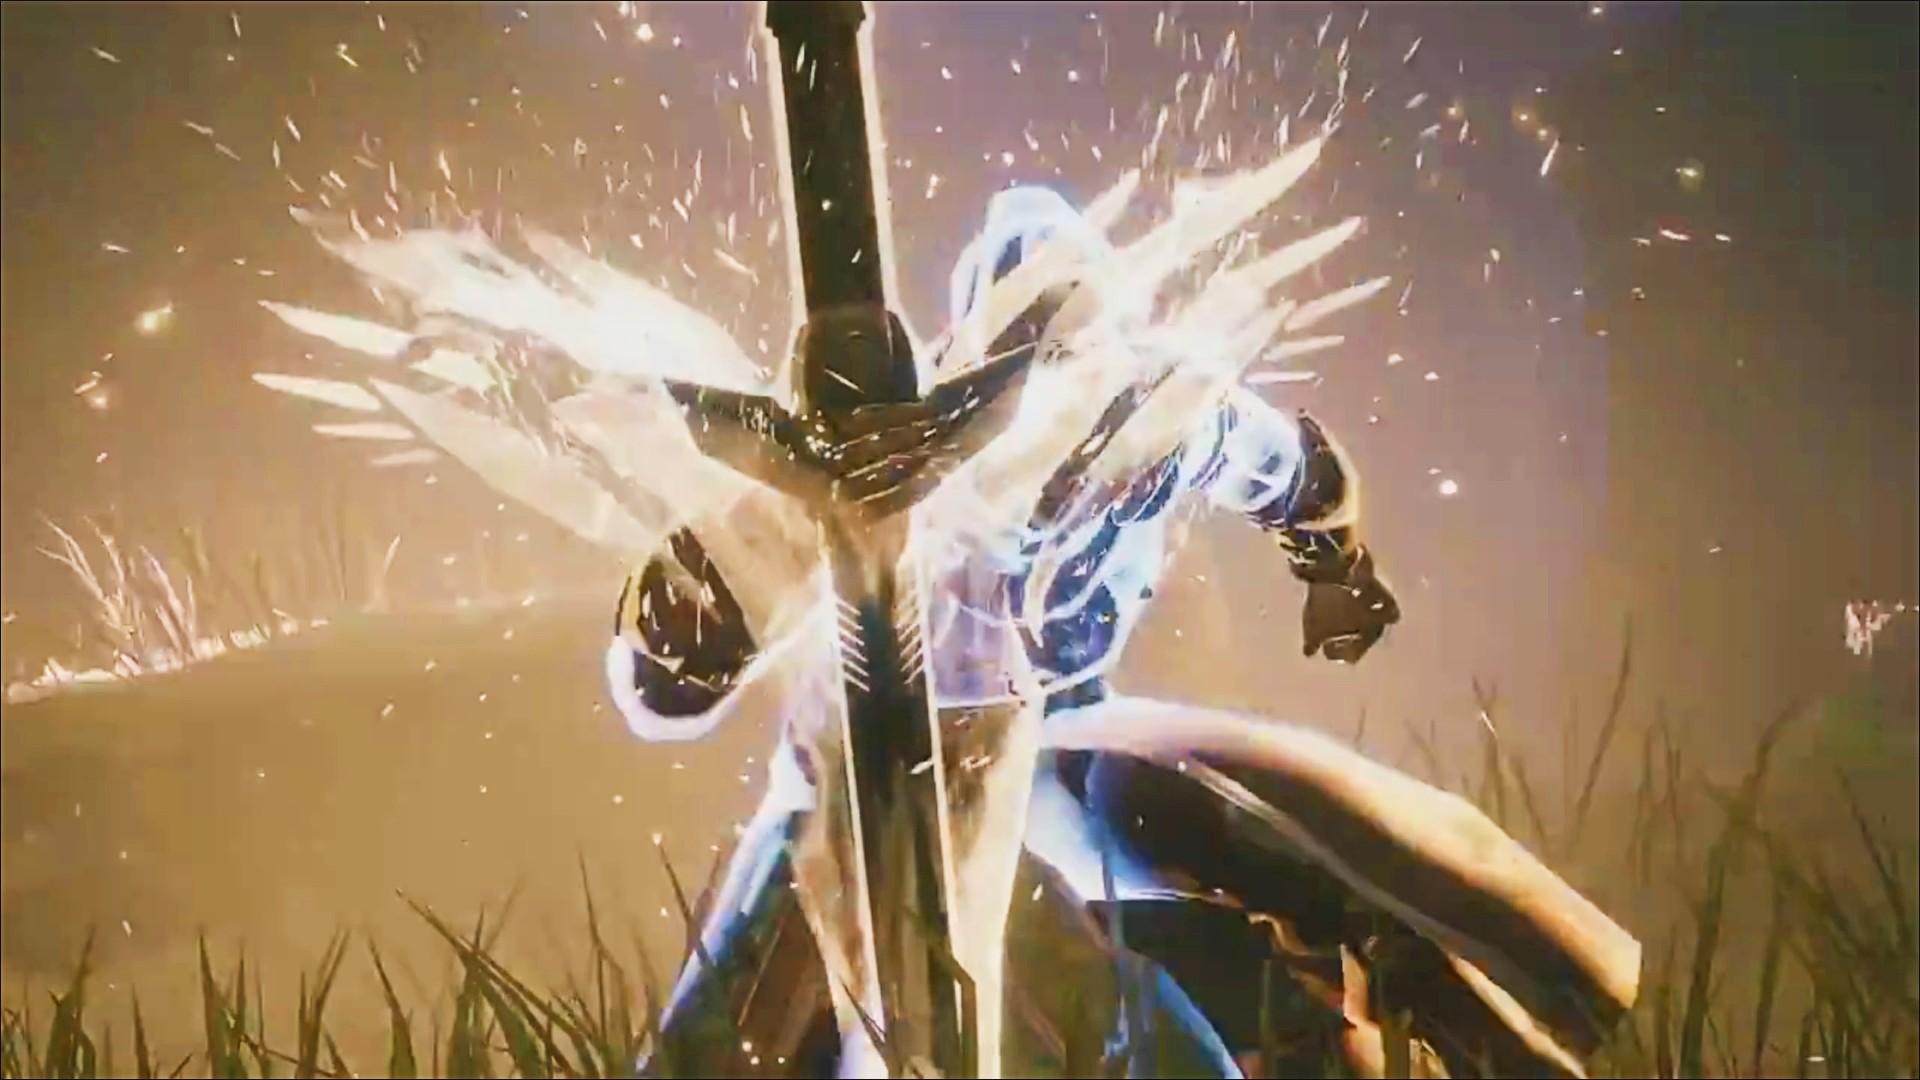 Destiny 2 guardian abilities are getting a serious rebalance next season